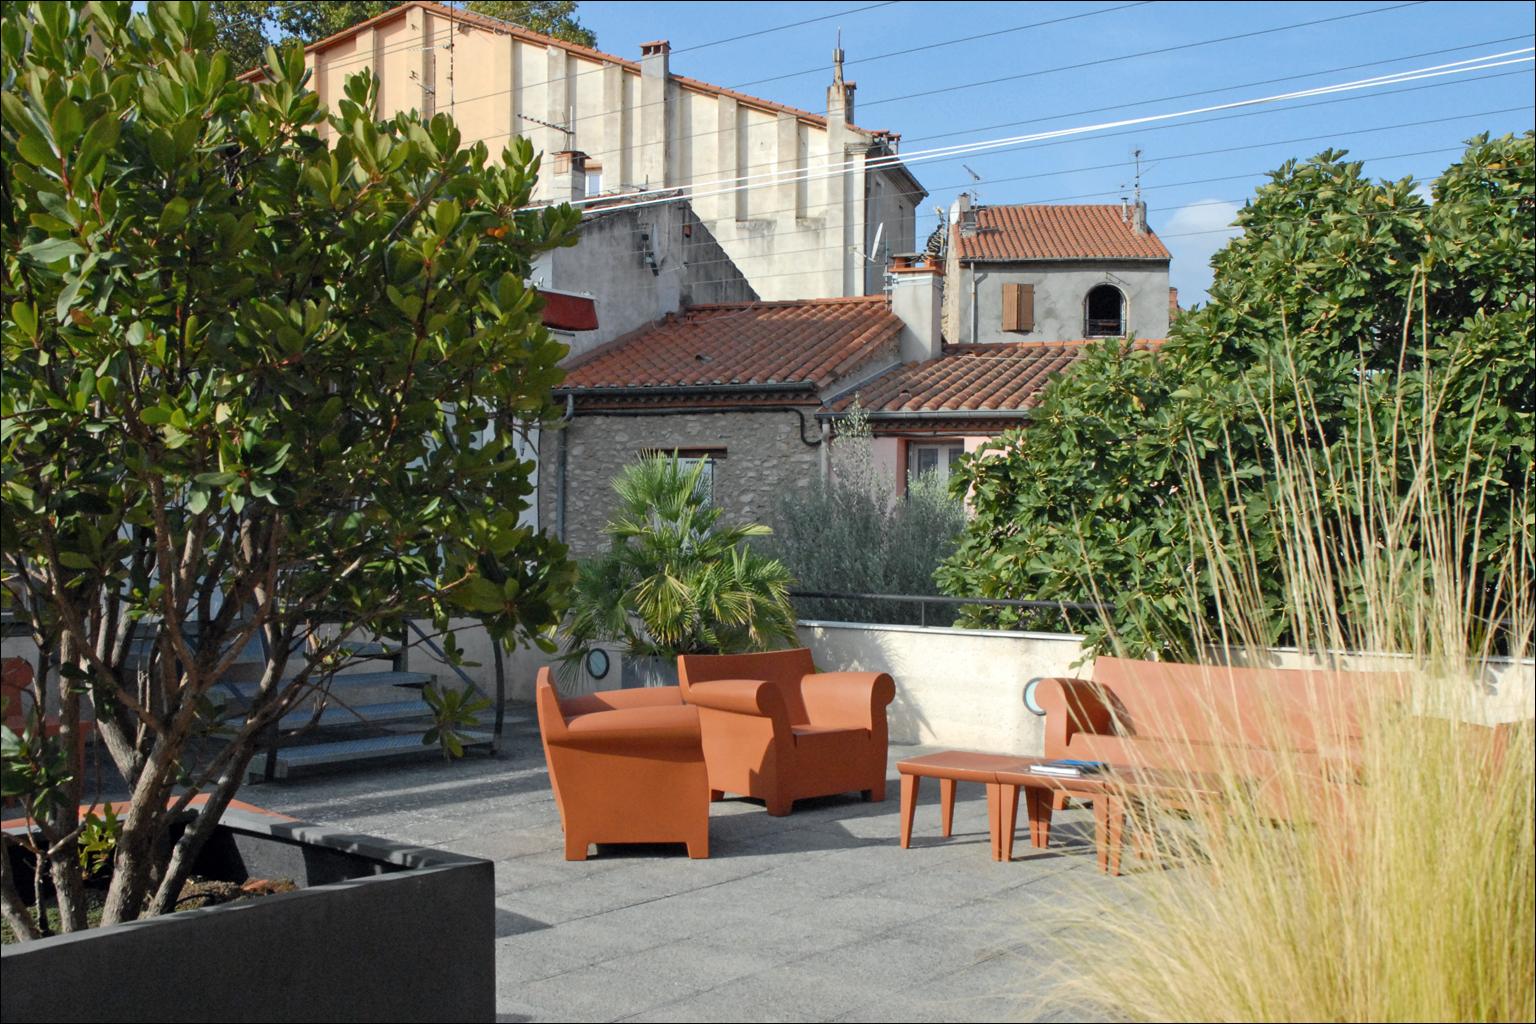 Terrasse Spa Patio file:terrasse dans le patio (musée dart moderne, céret) (6249674541